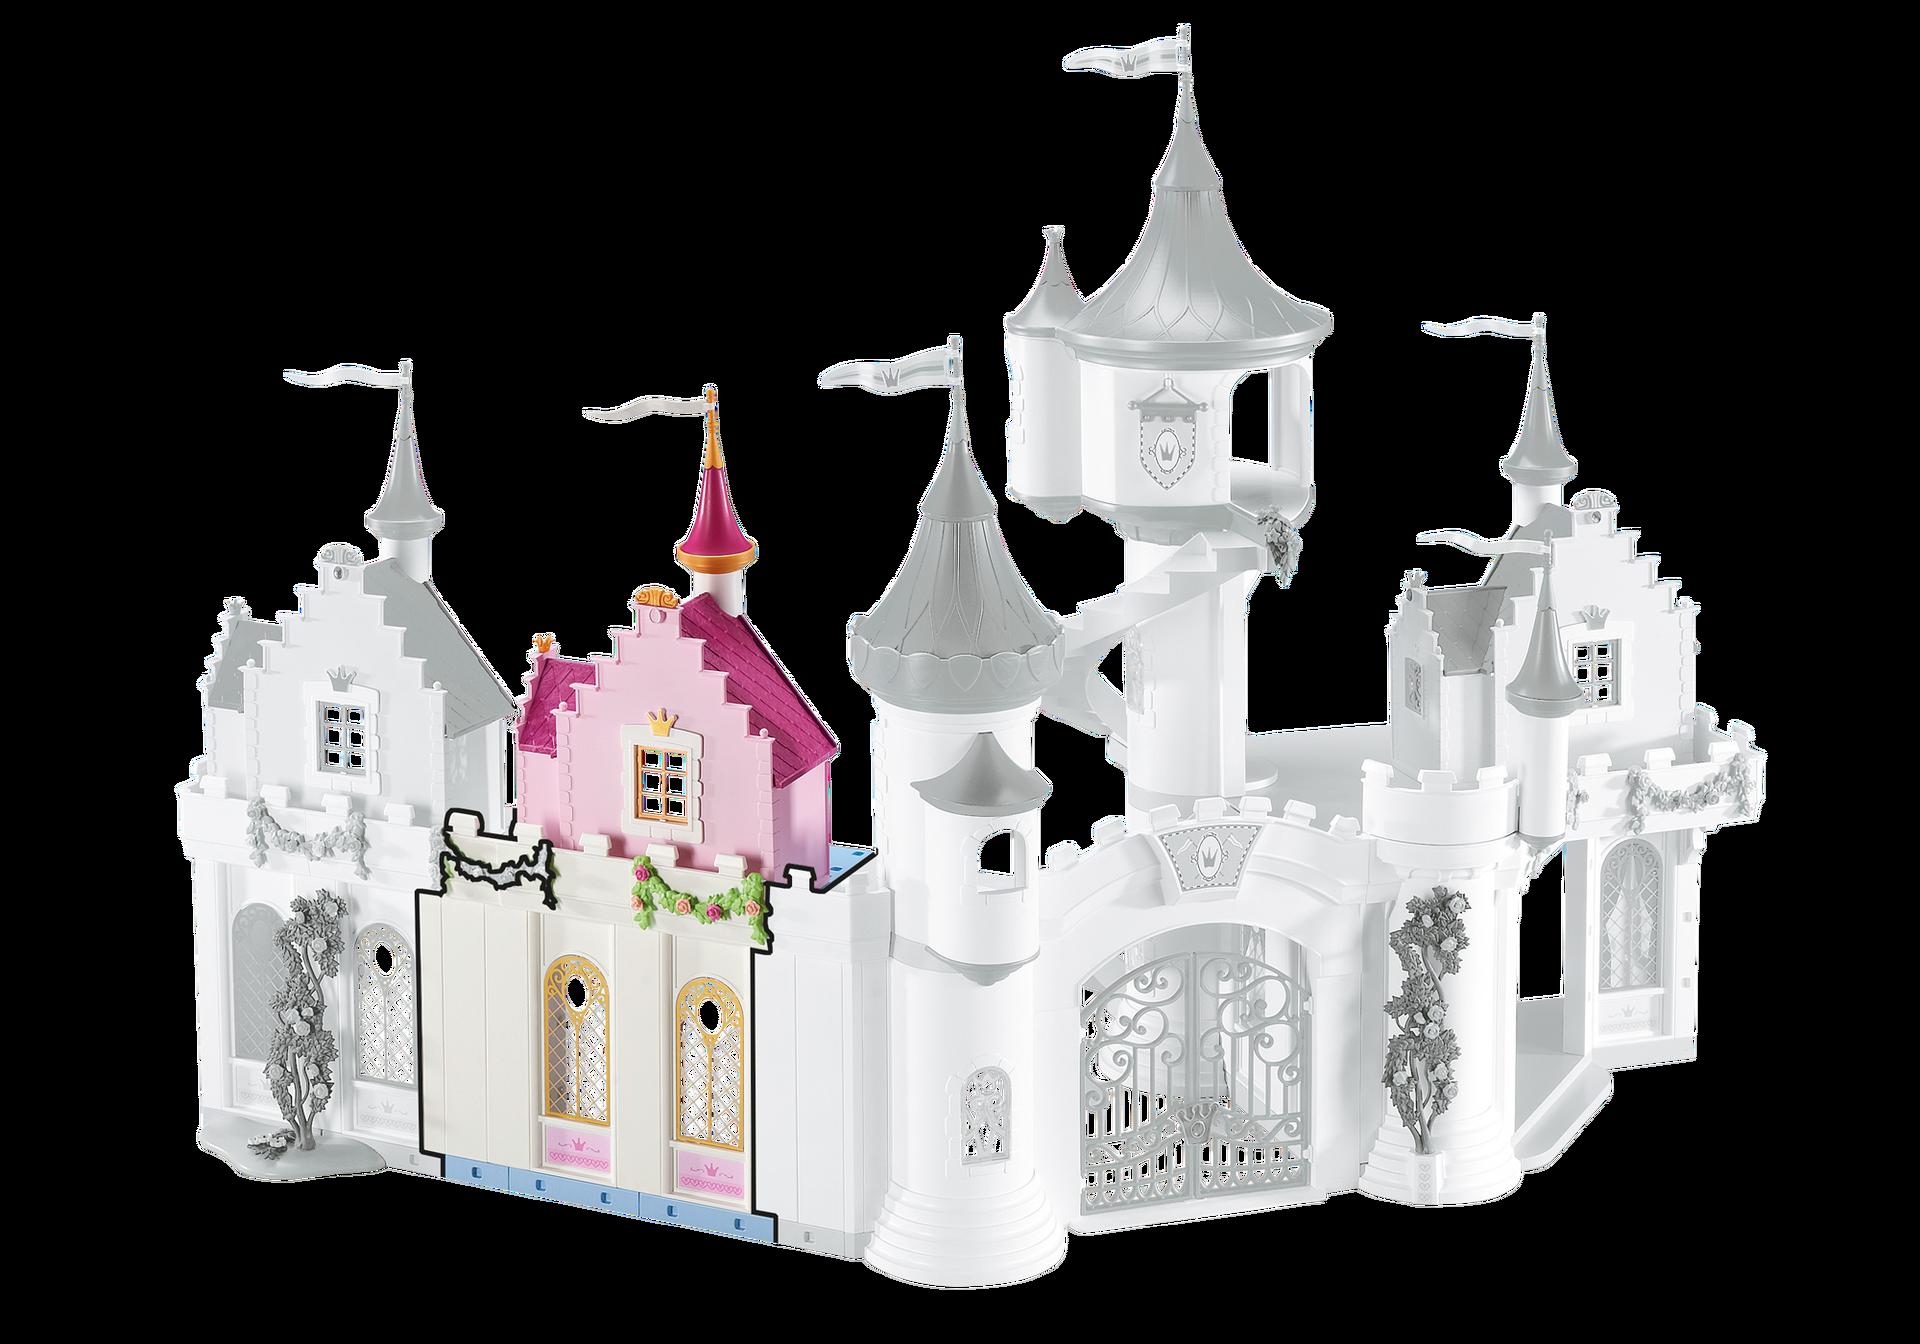 princess castle extension b 6519 playmobil. Black Bedroom Furniture Sets. Home Design Ideas